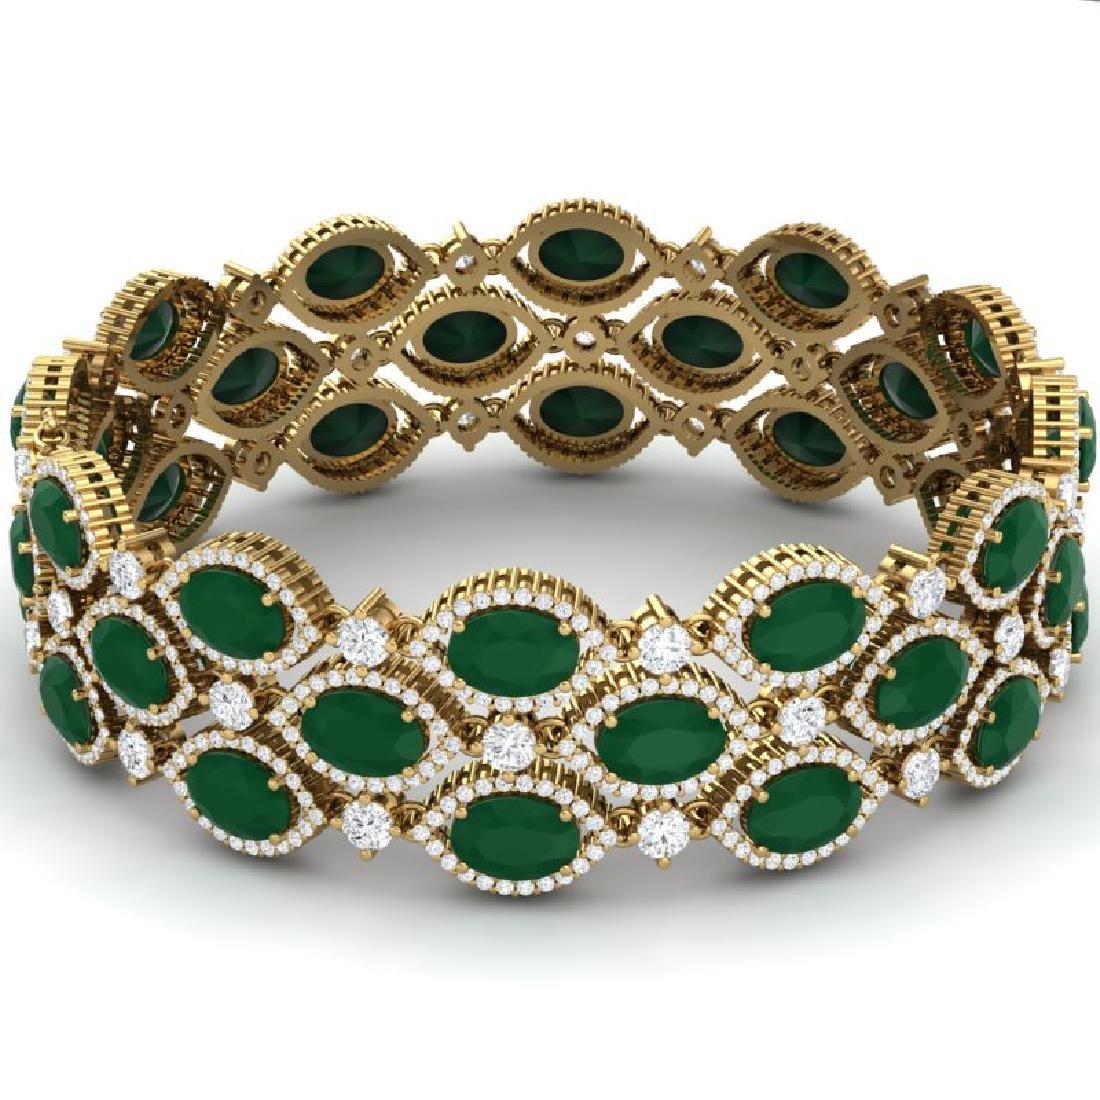 47.84 CTW Royalty Emerald & VS Diamond Bracelet 18K - 3